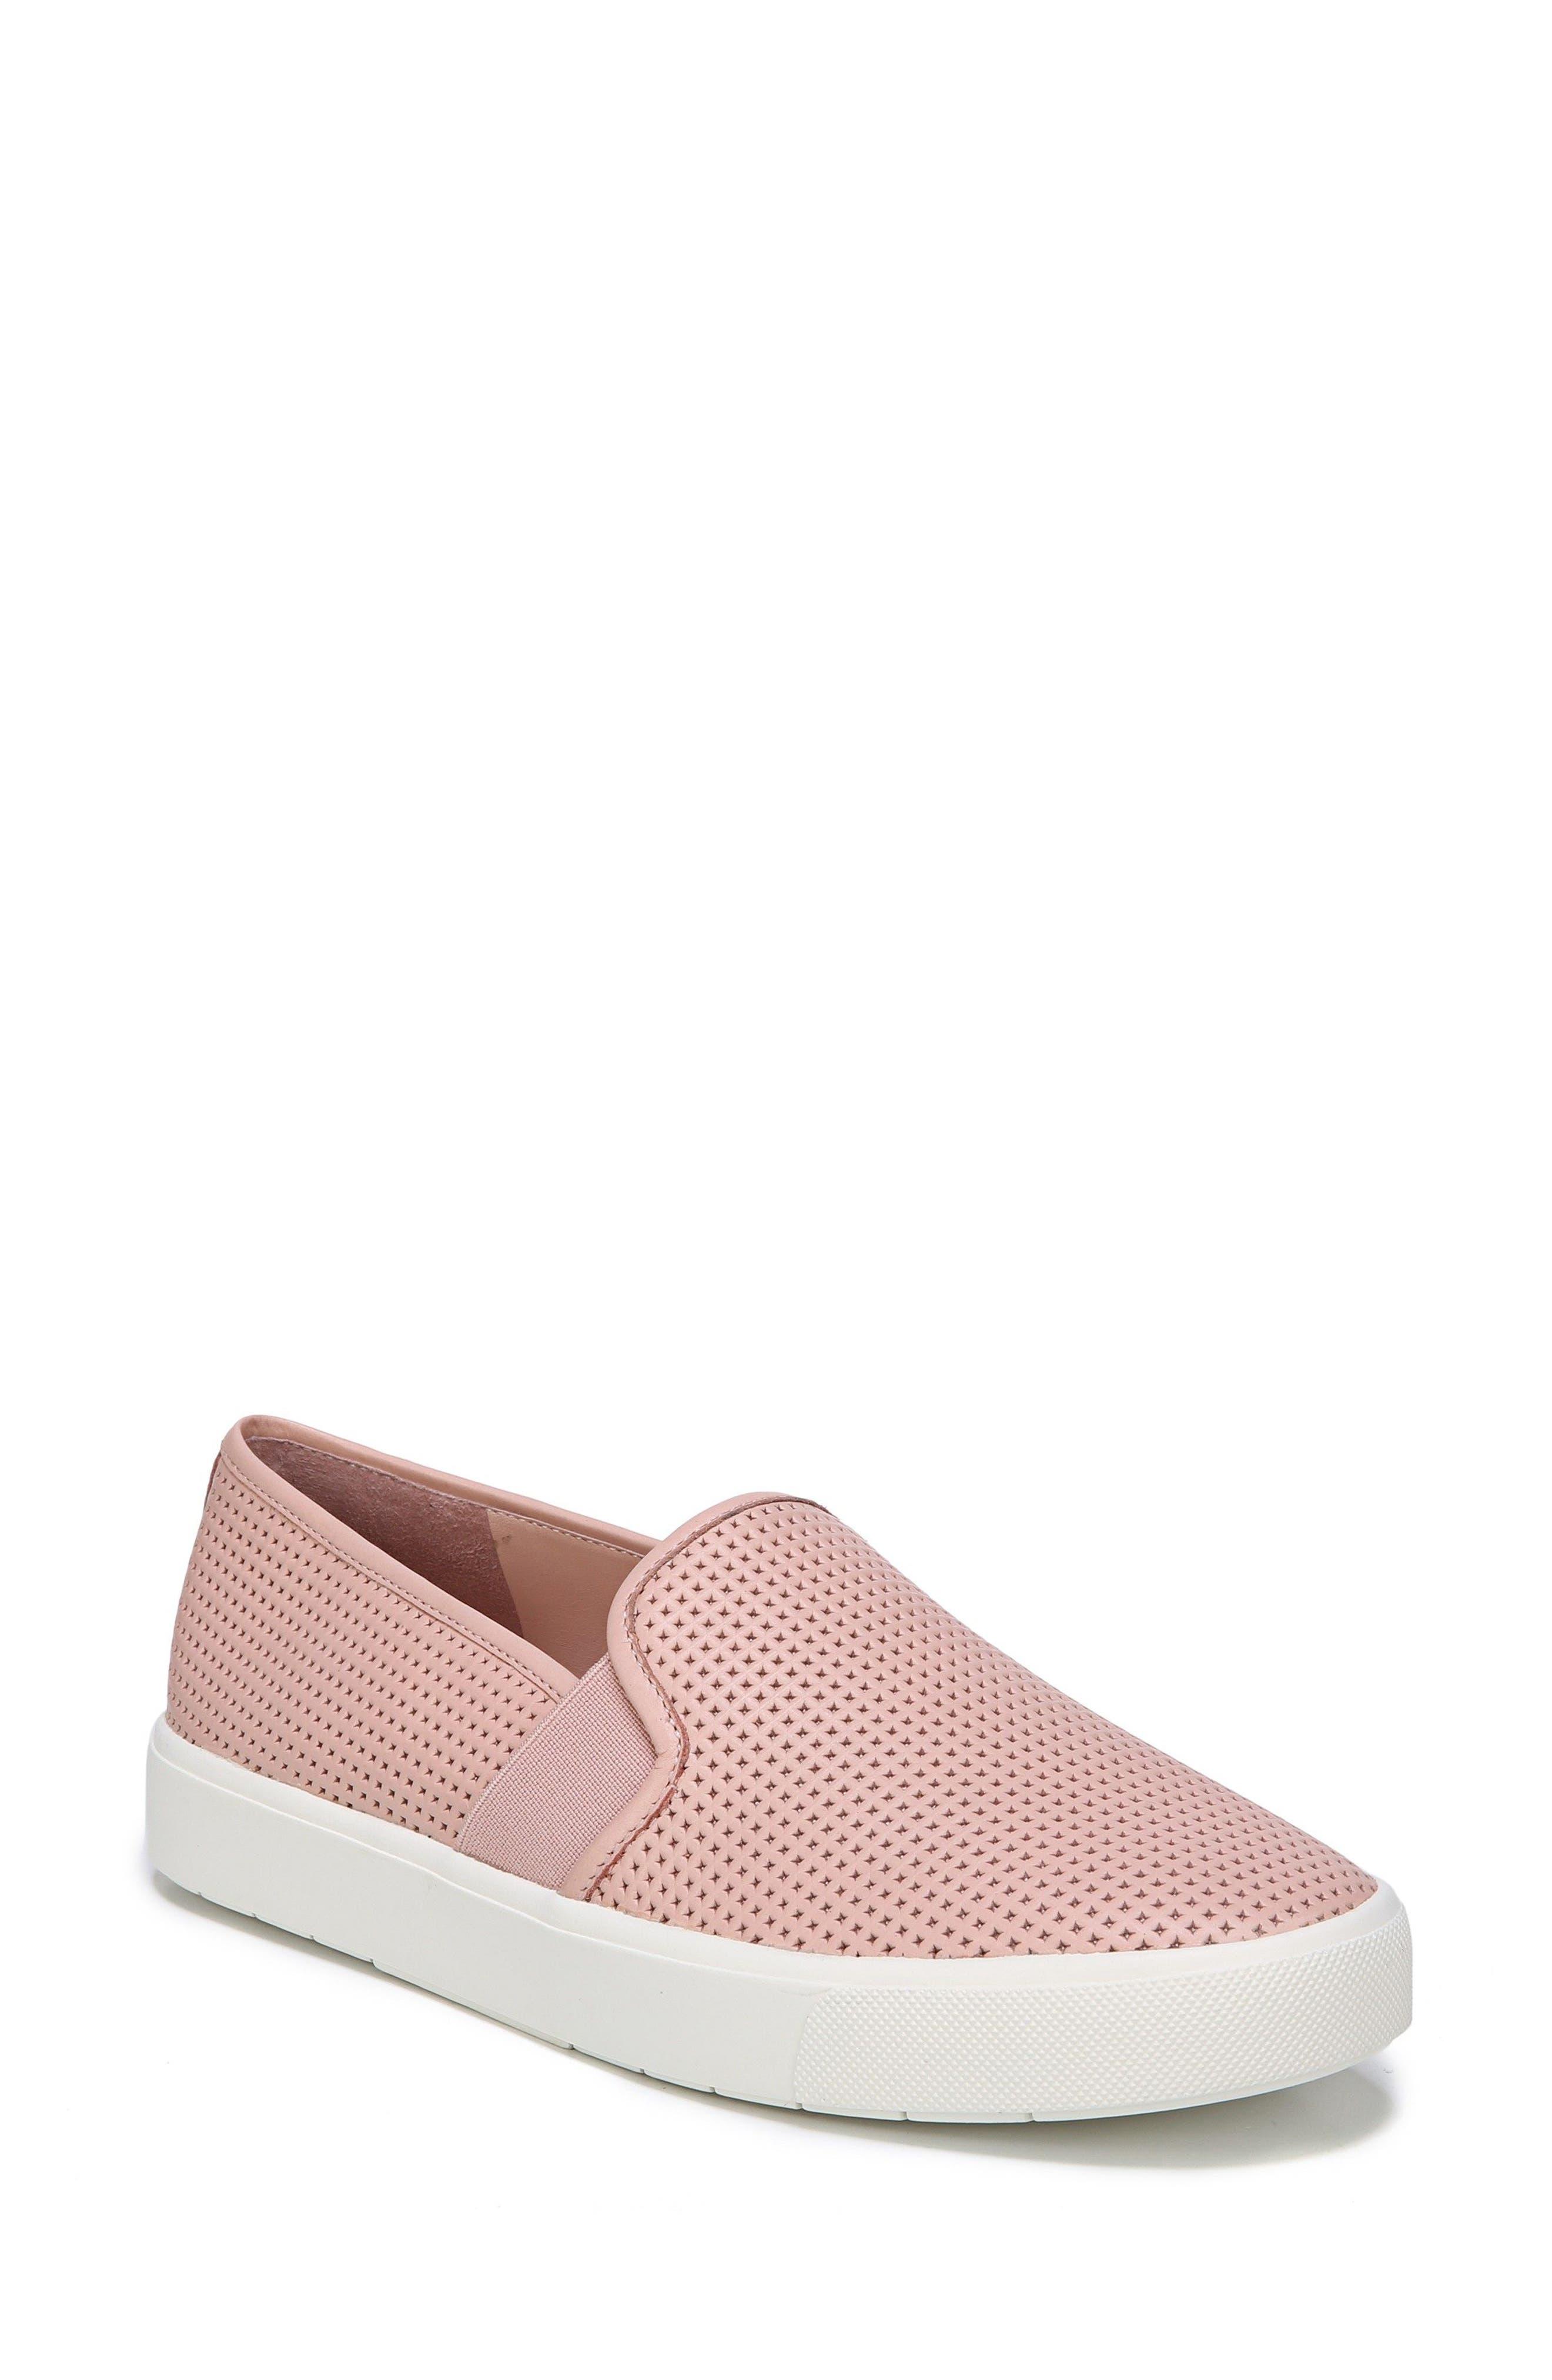 Blair 5 Slip-On Sneaker,                             Main thumbnail 1, color,                             ROSE